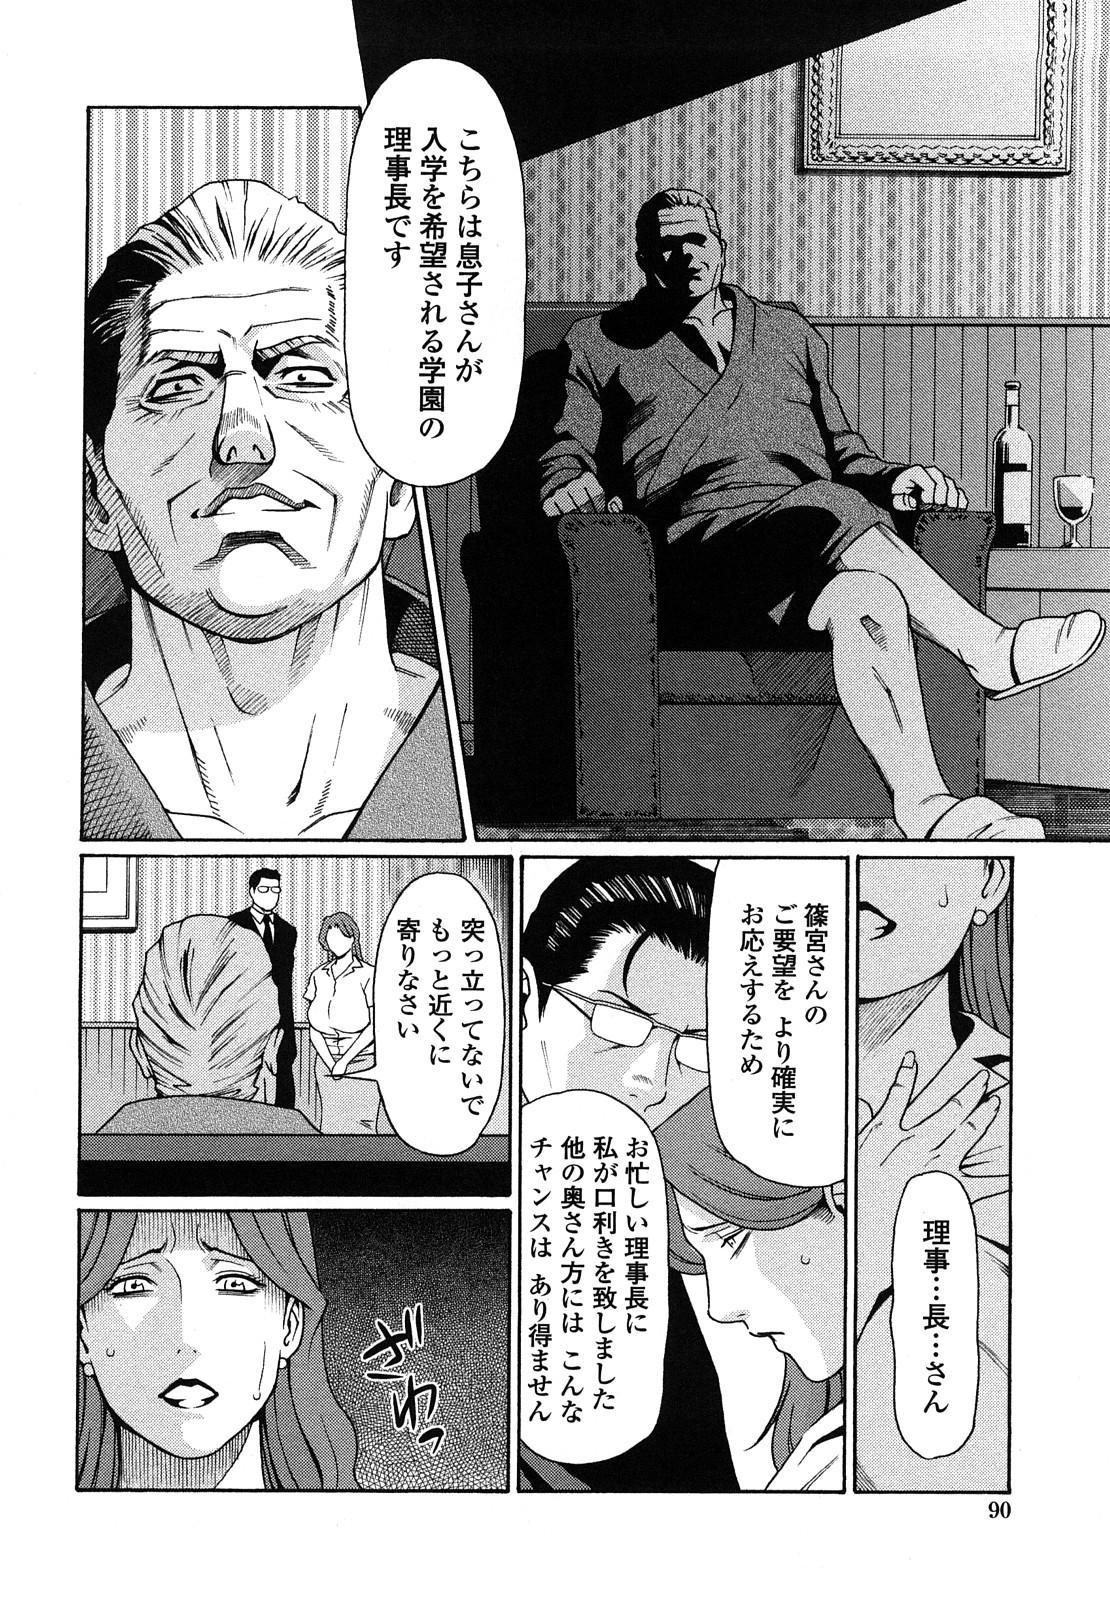 [Takasugi Kou] Kindan no Haha-Ana - Immorality Love-Hole [Decensored] 91